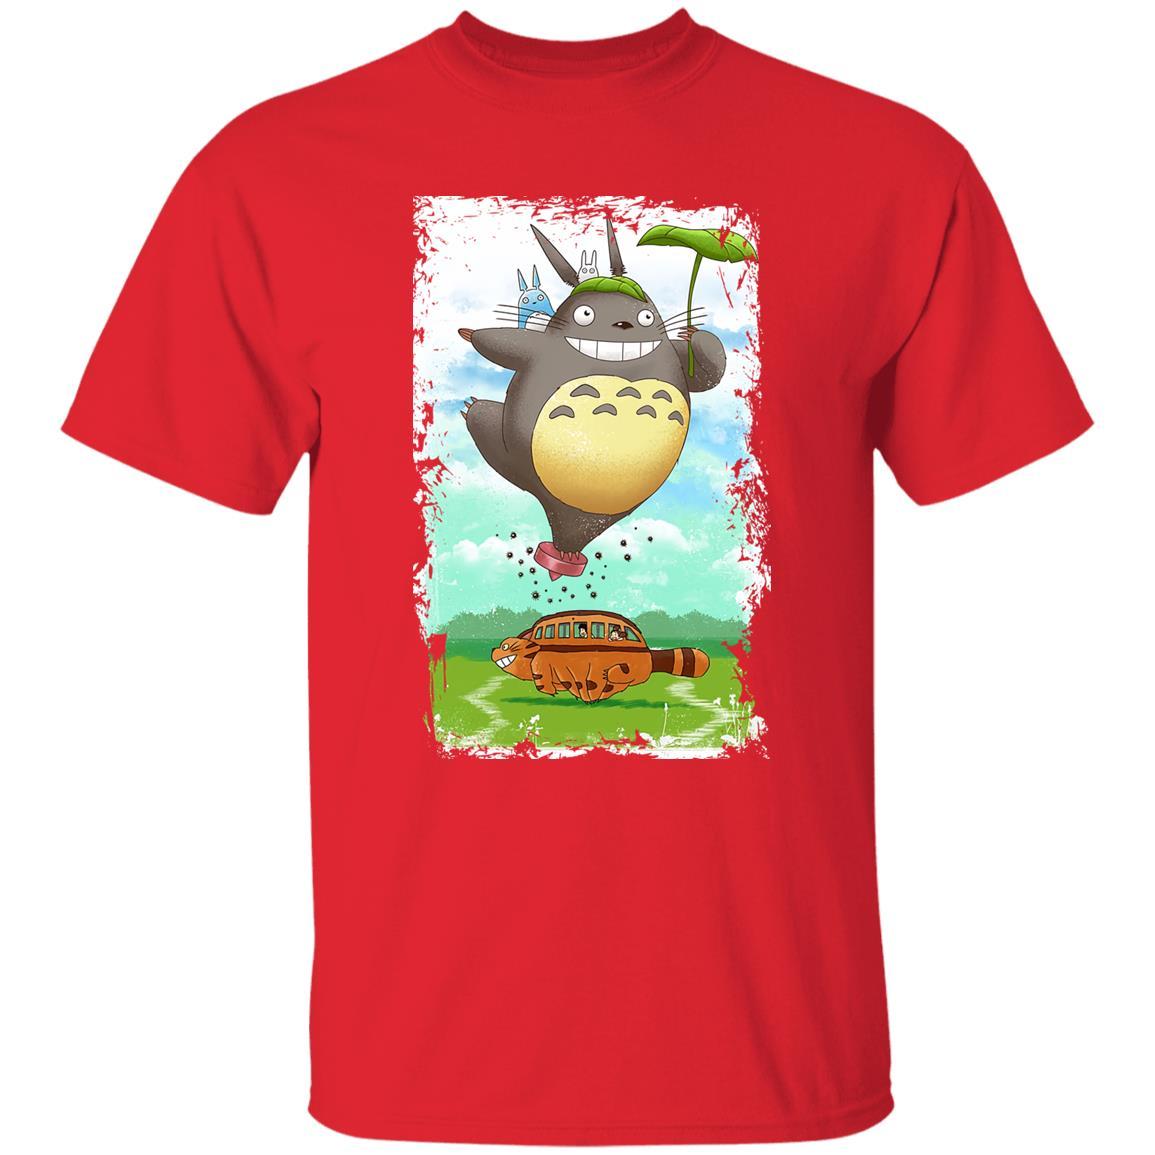 Totoro the Funny Neighbor T Shirt